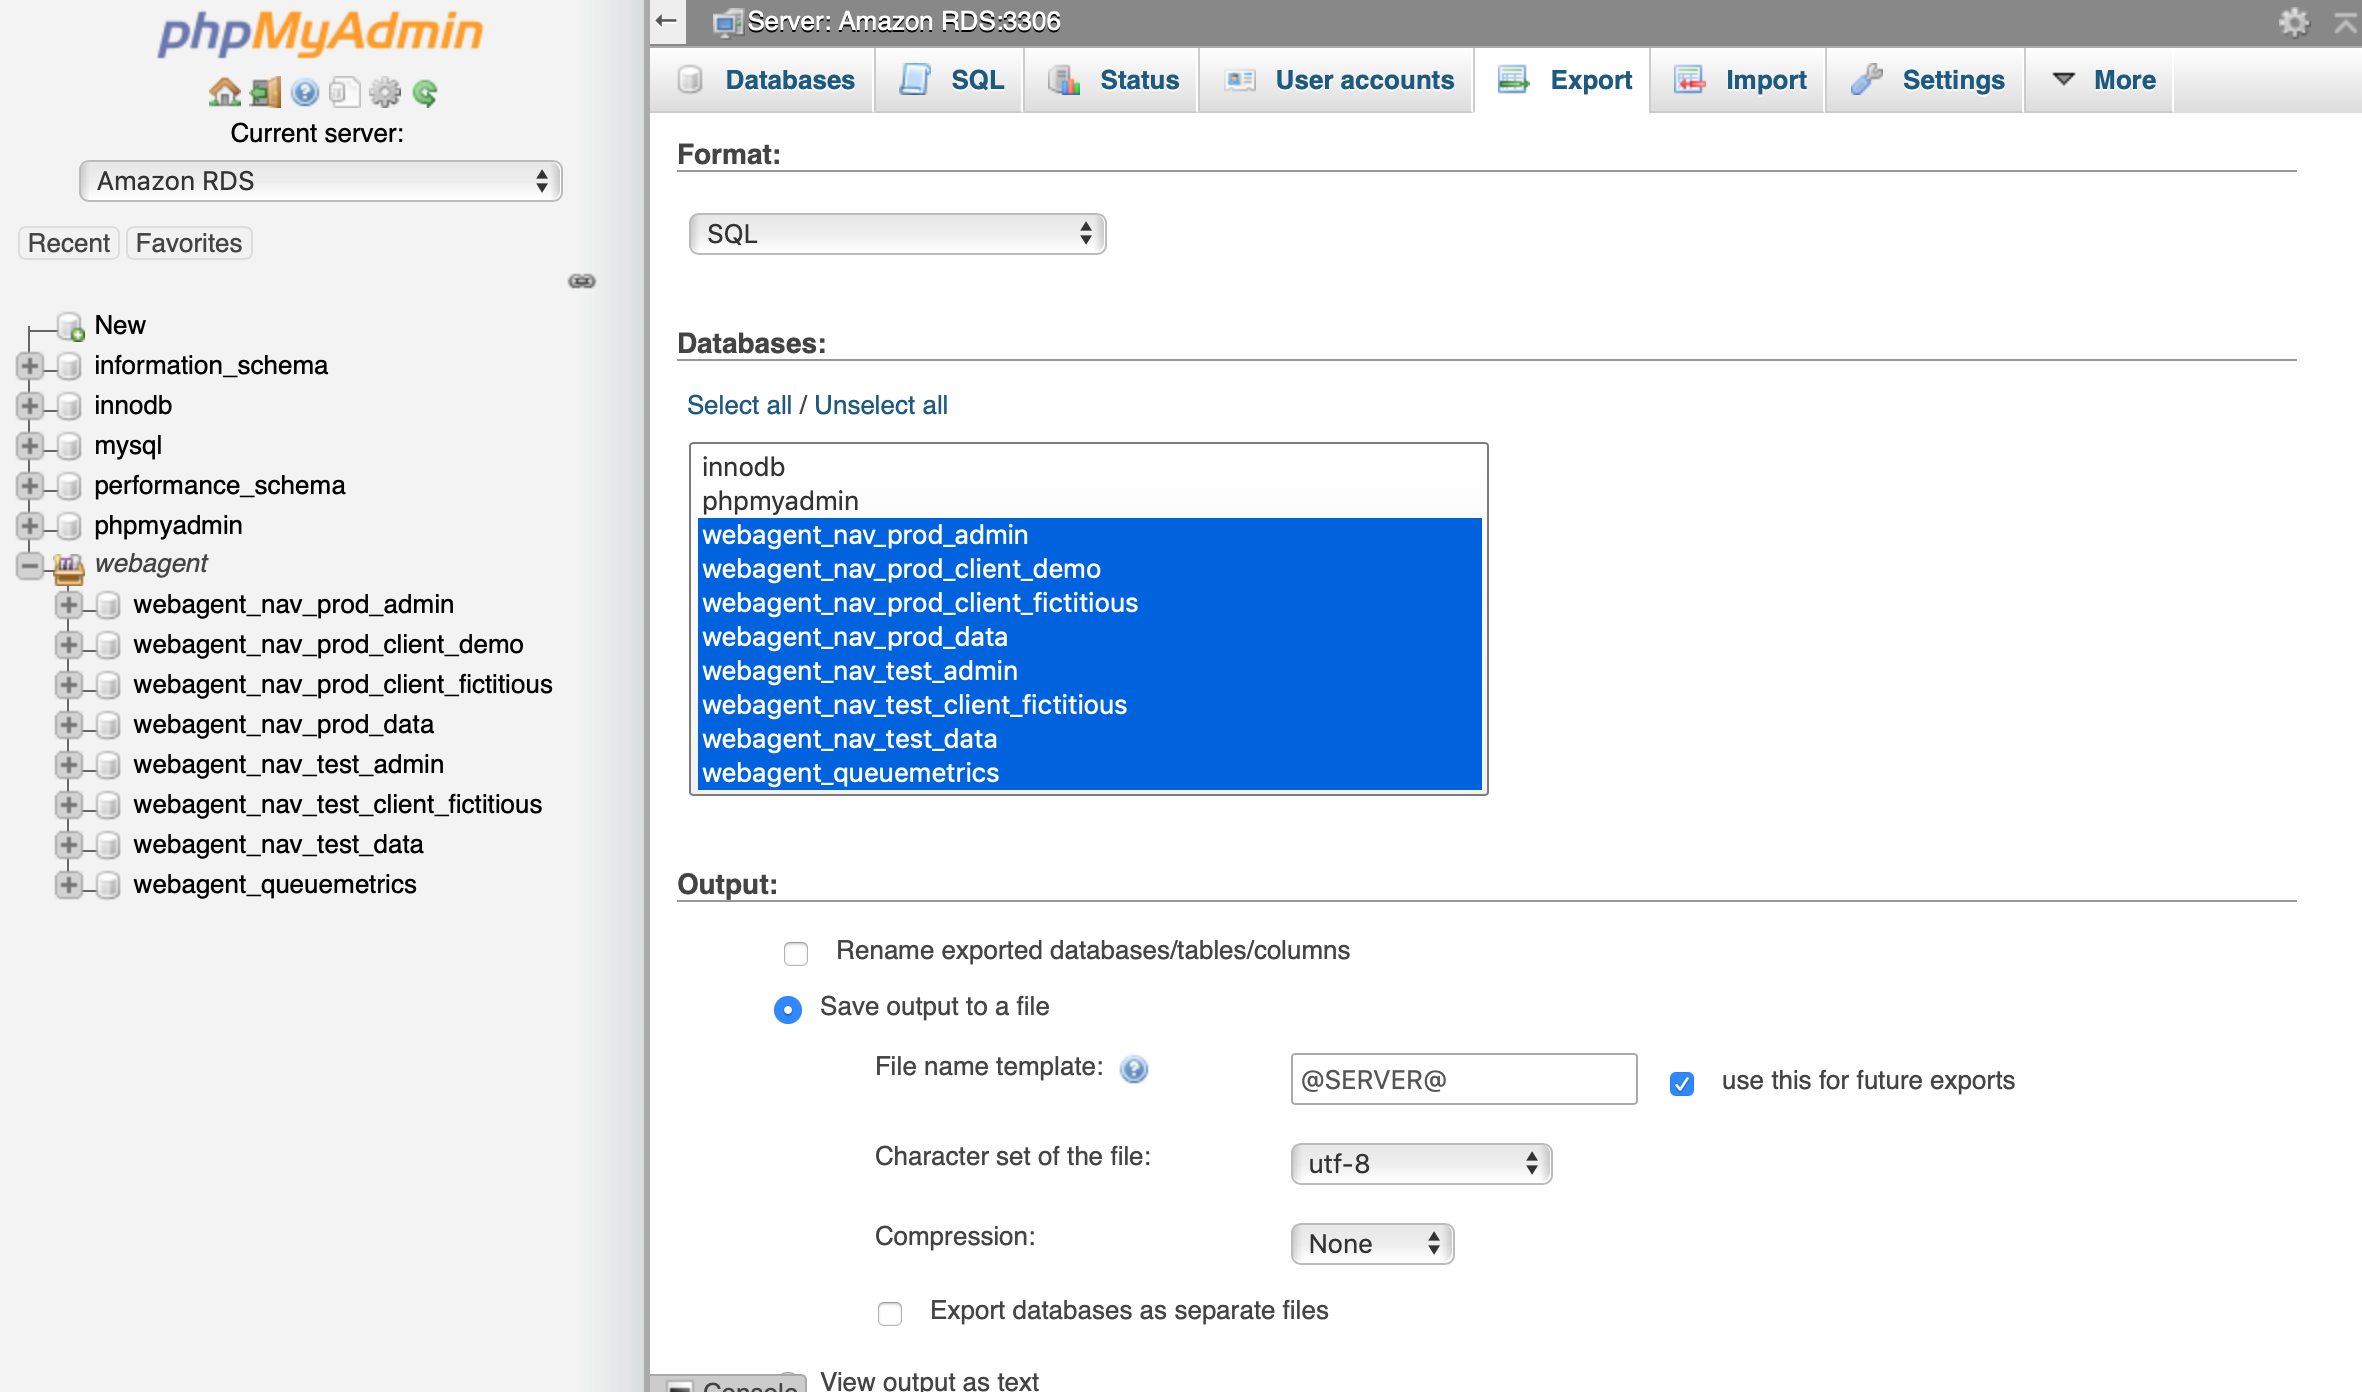 Exporting WebAgent databases using phpMyAdmin